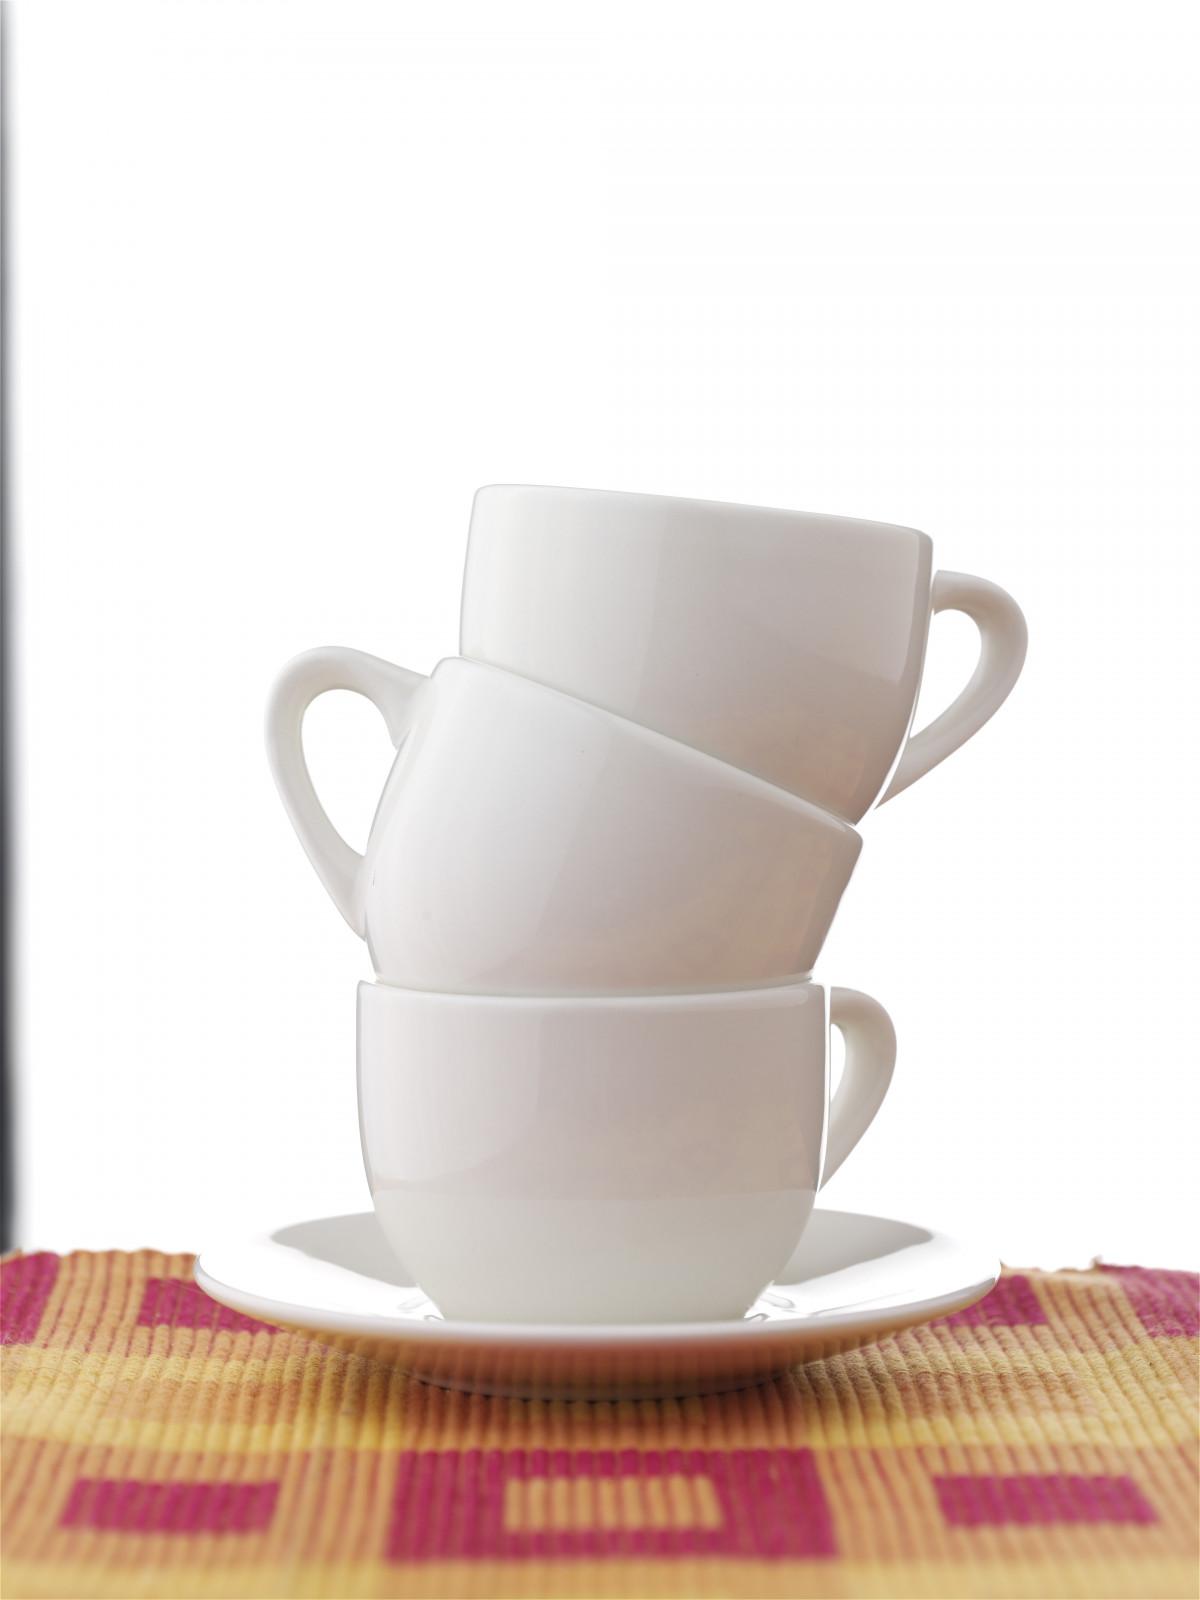 Gambar Teko Lepek Keramik Dapur Minum Sarapan Espreso Mangkok Cangkir Kopi Barang Pecah Belah Kafein Panas Porselen Berhenti Sebentar